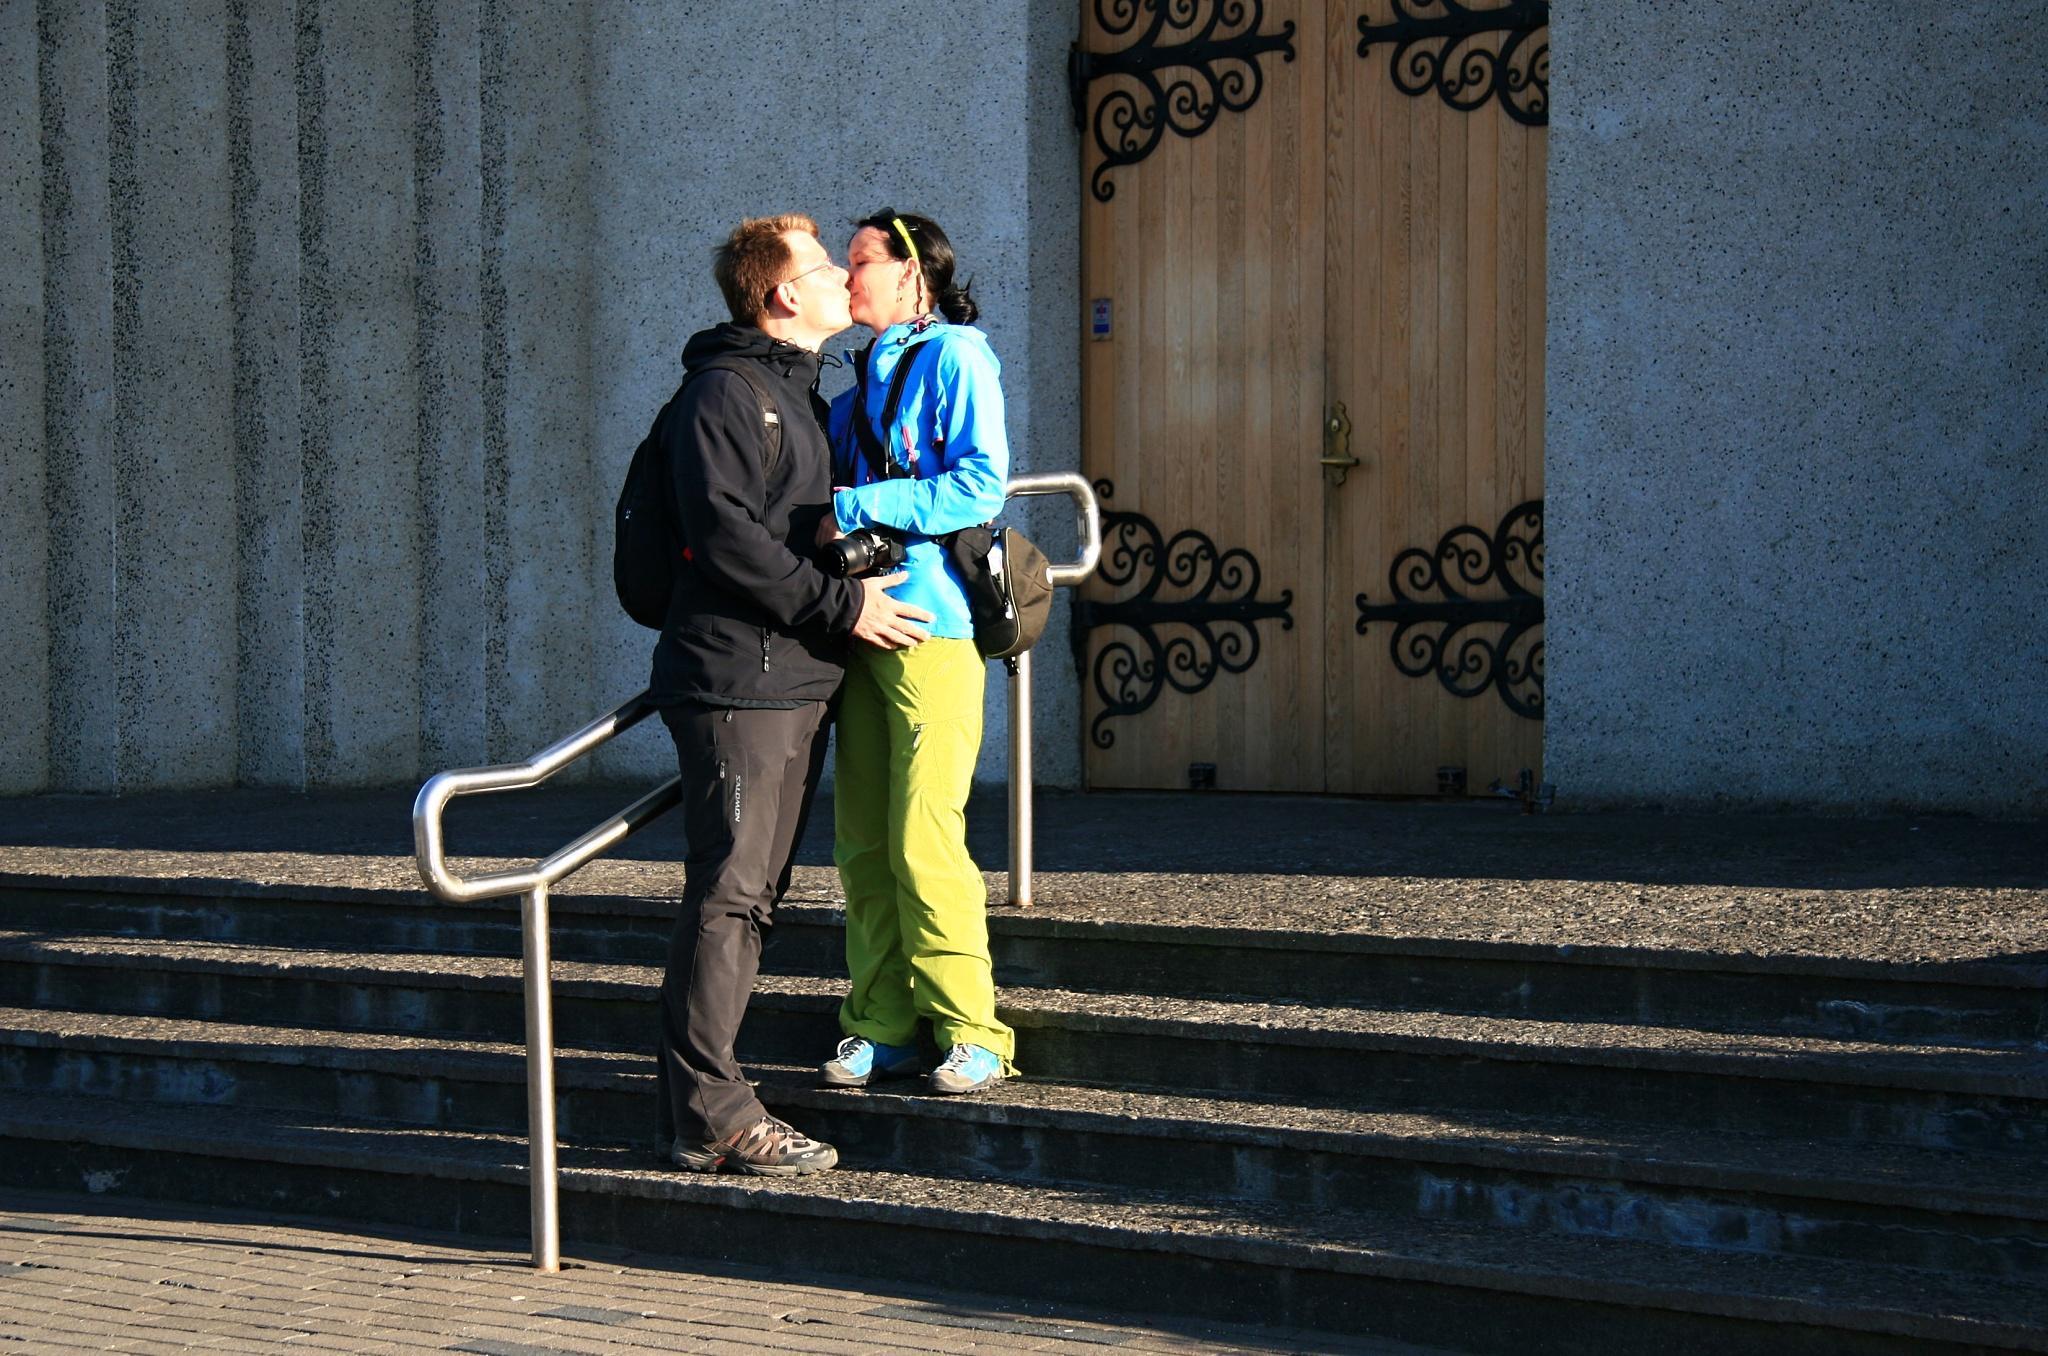 Polibek před kostelem Akureyrarkirkja